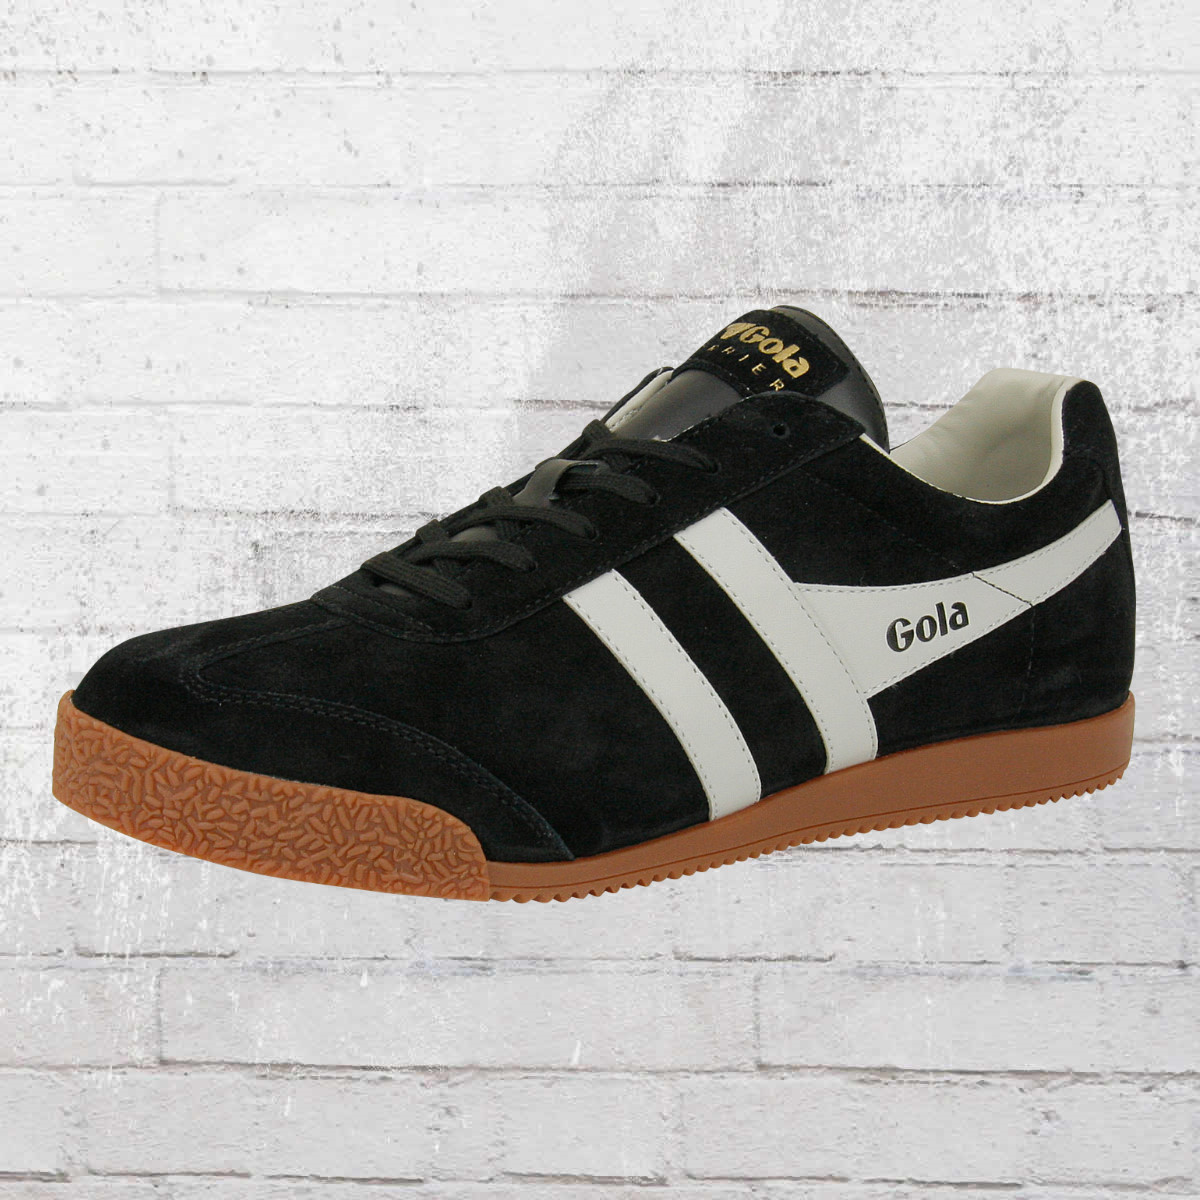 Gola Male Shoes Harrier Suede Retro Sneaker black grey. ›‹ «